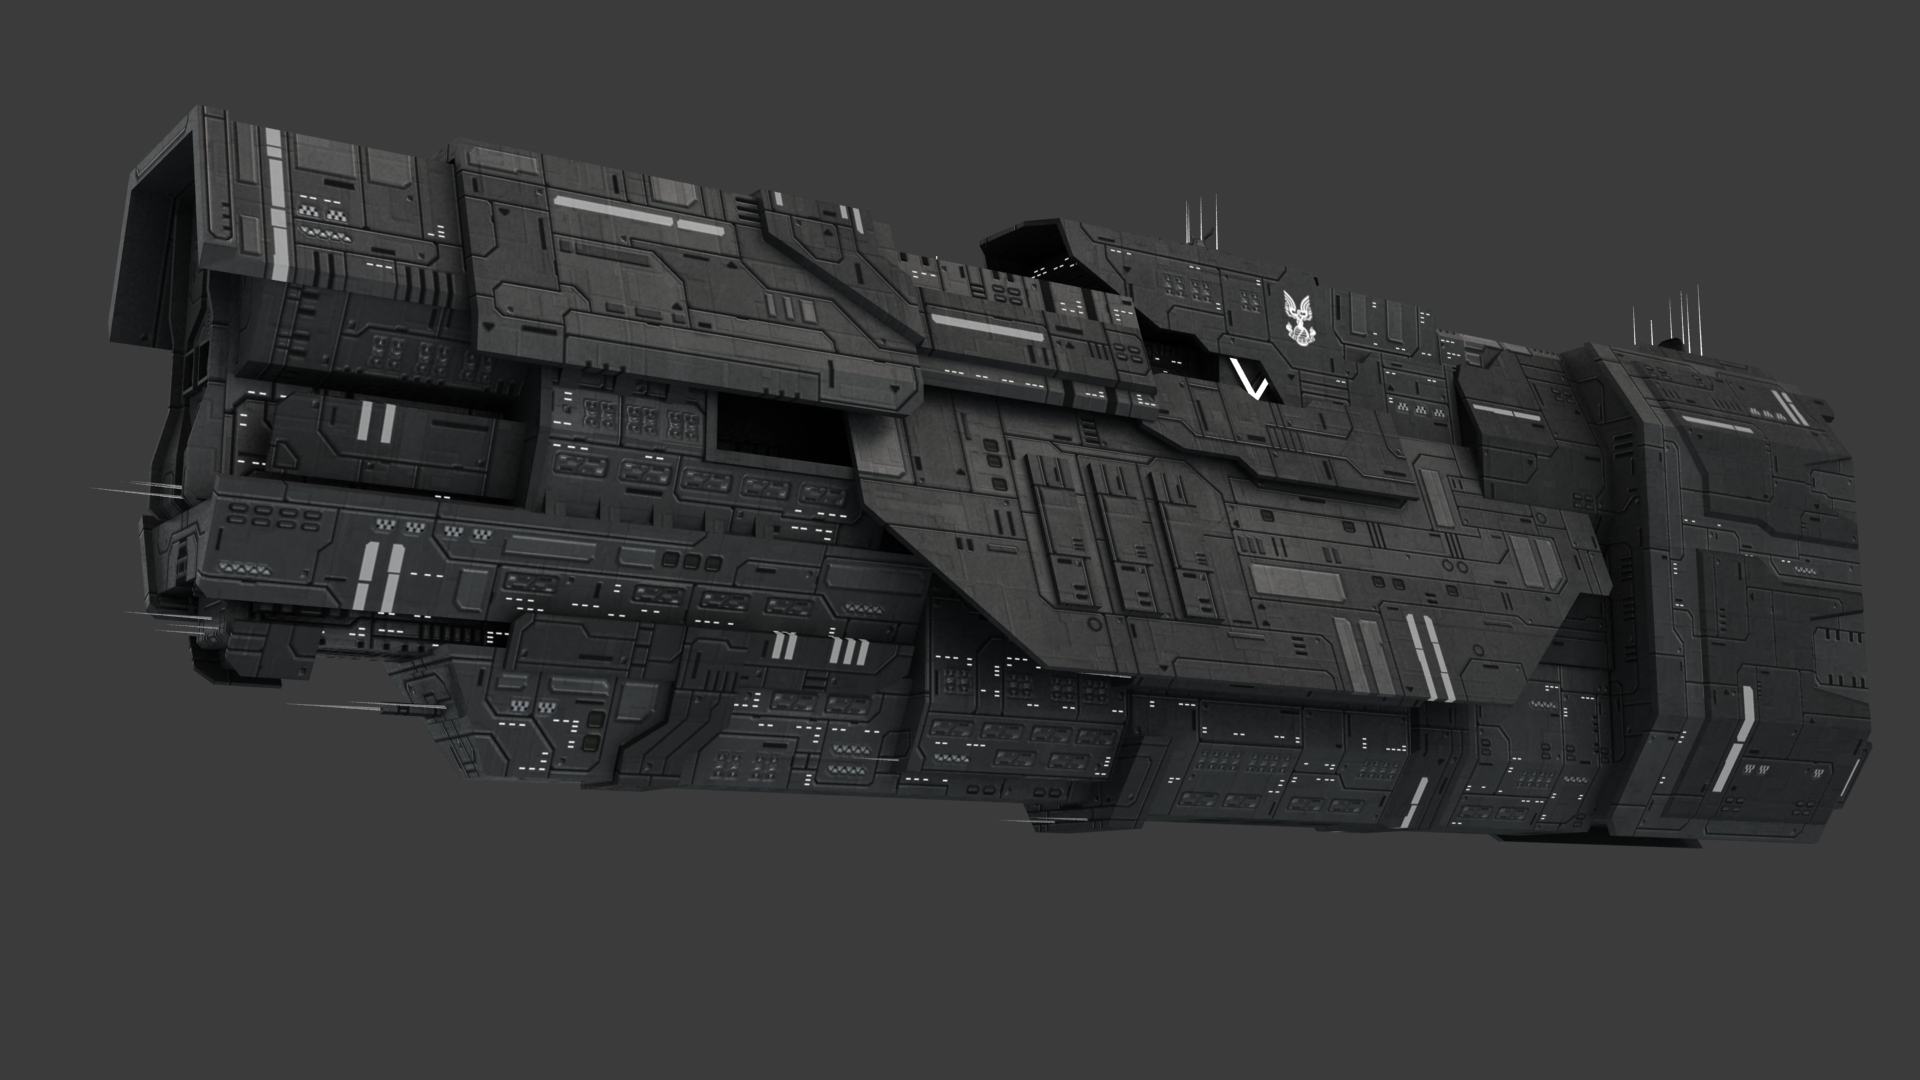 Kataphrakt-class Battleship